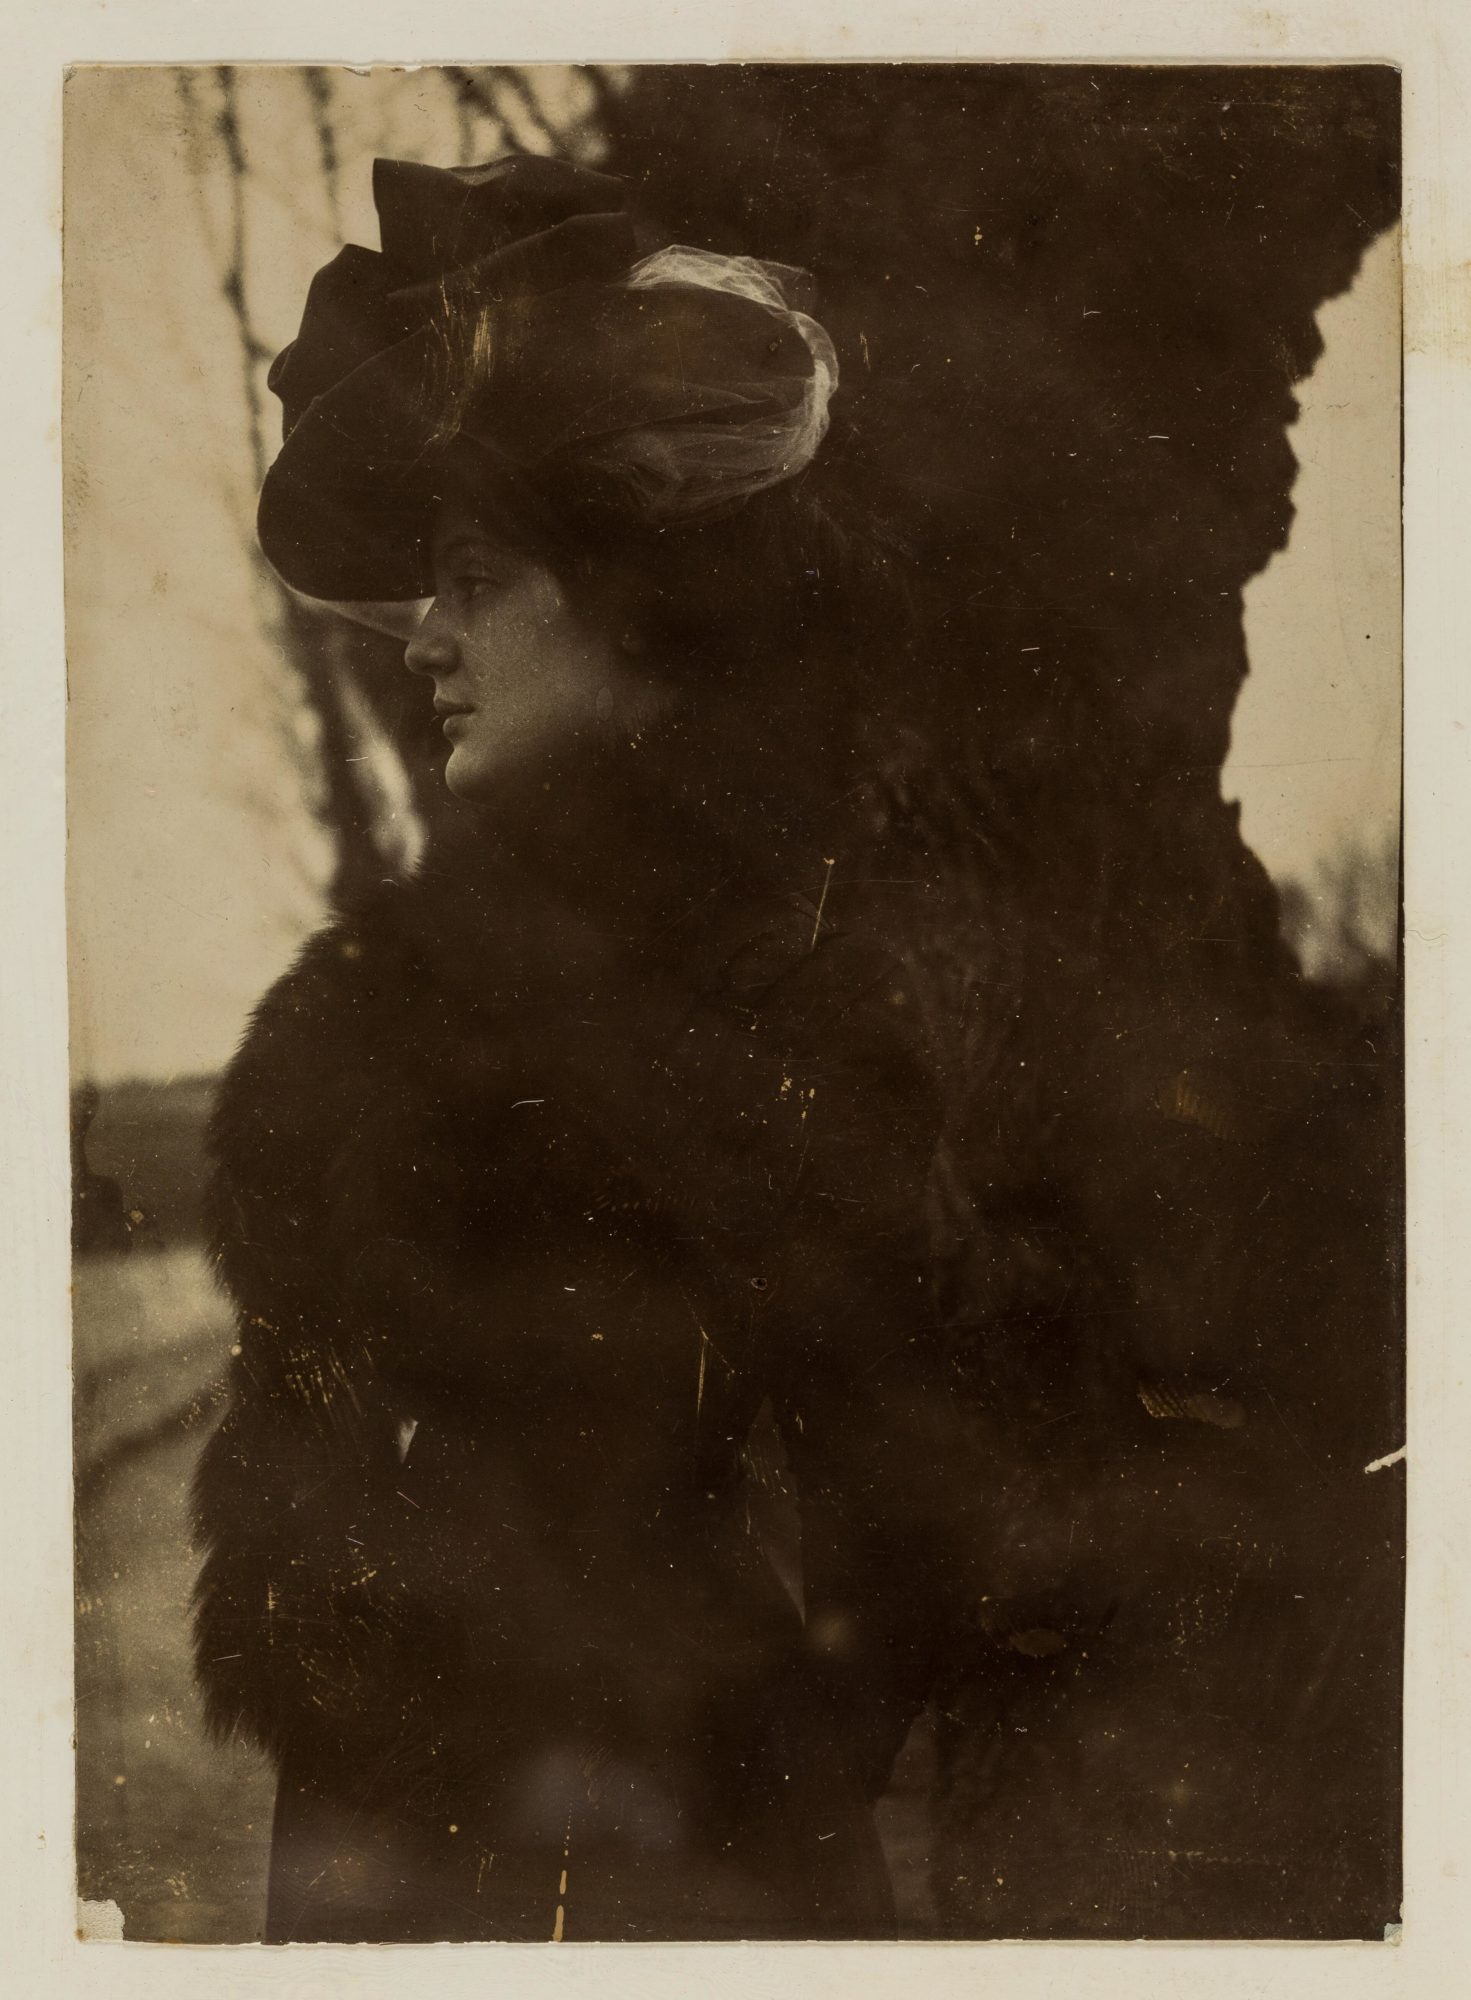 Melanie Klein 1906-1907間的模樣